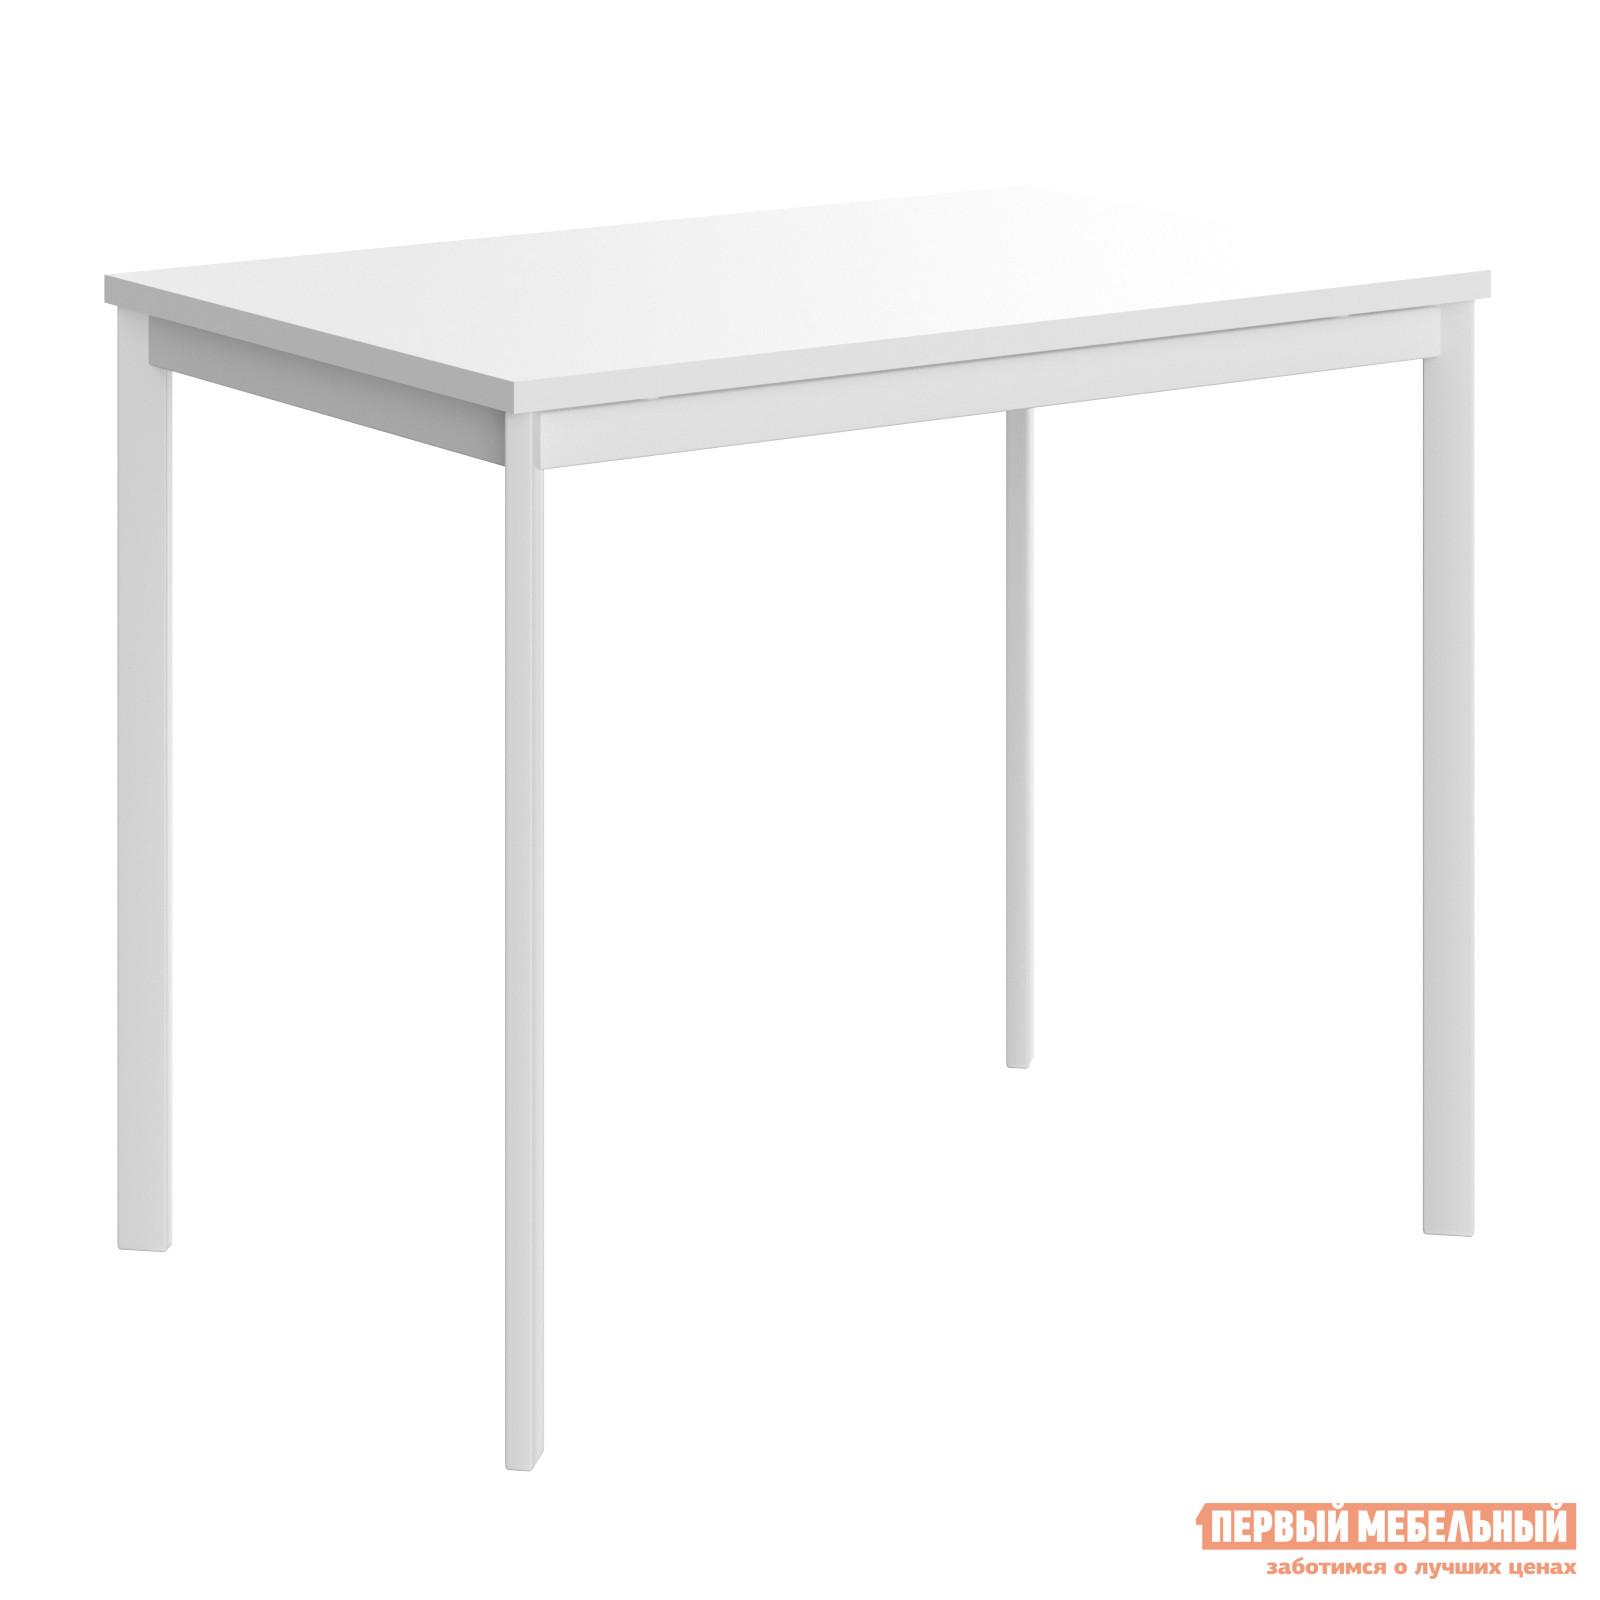 Письменный стол Тайпит СП-1.1S/СП-2.1S/СП-3.1S